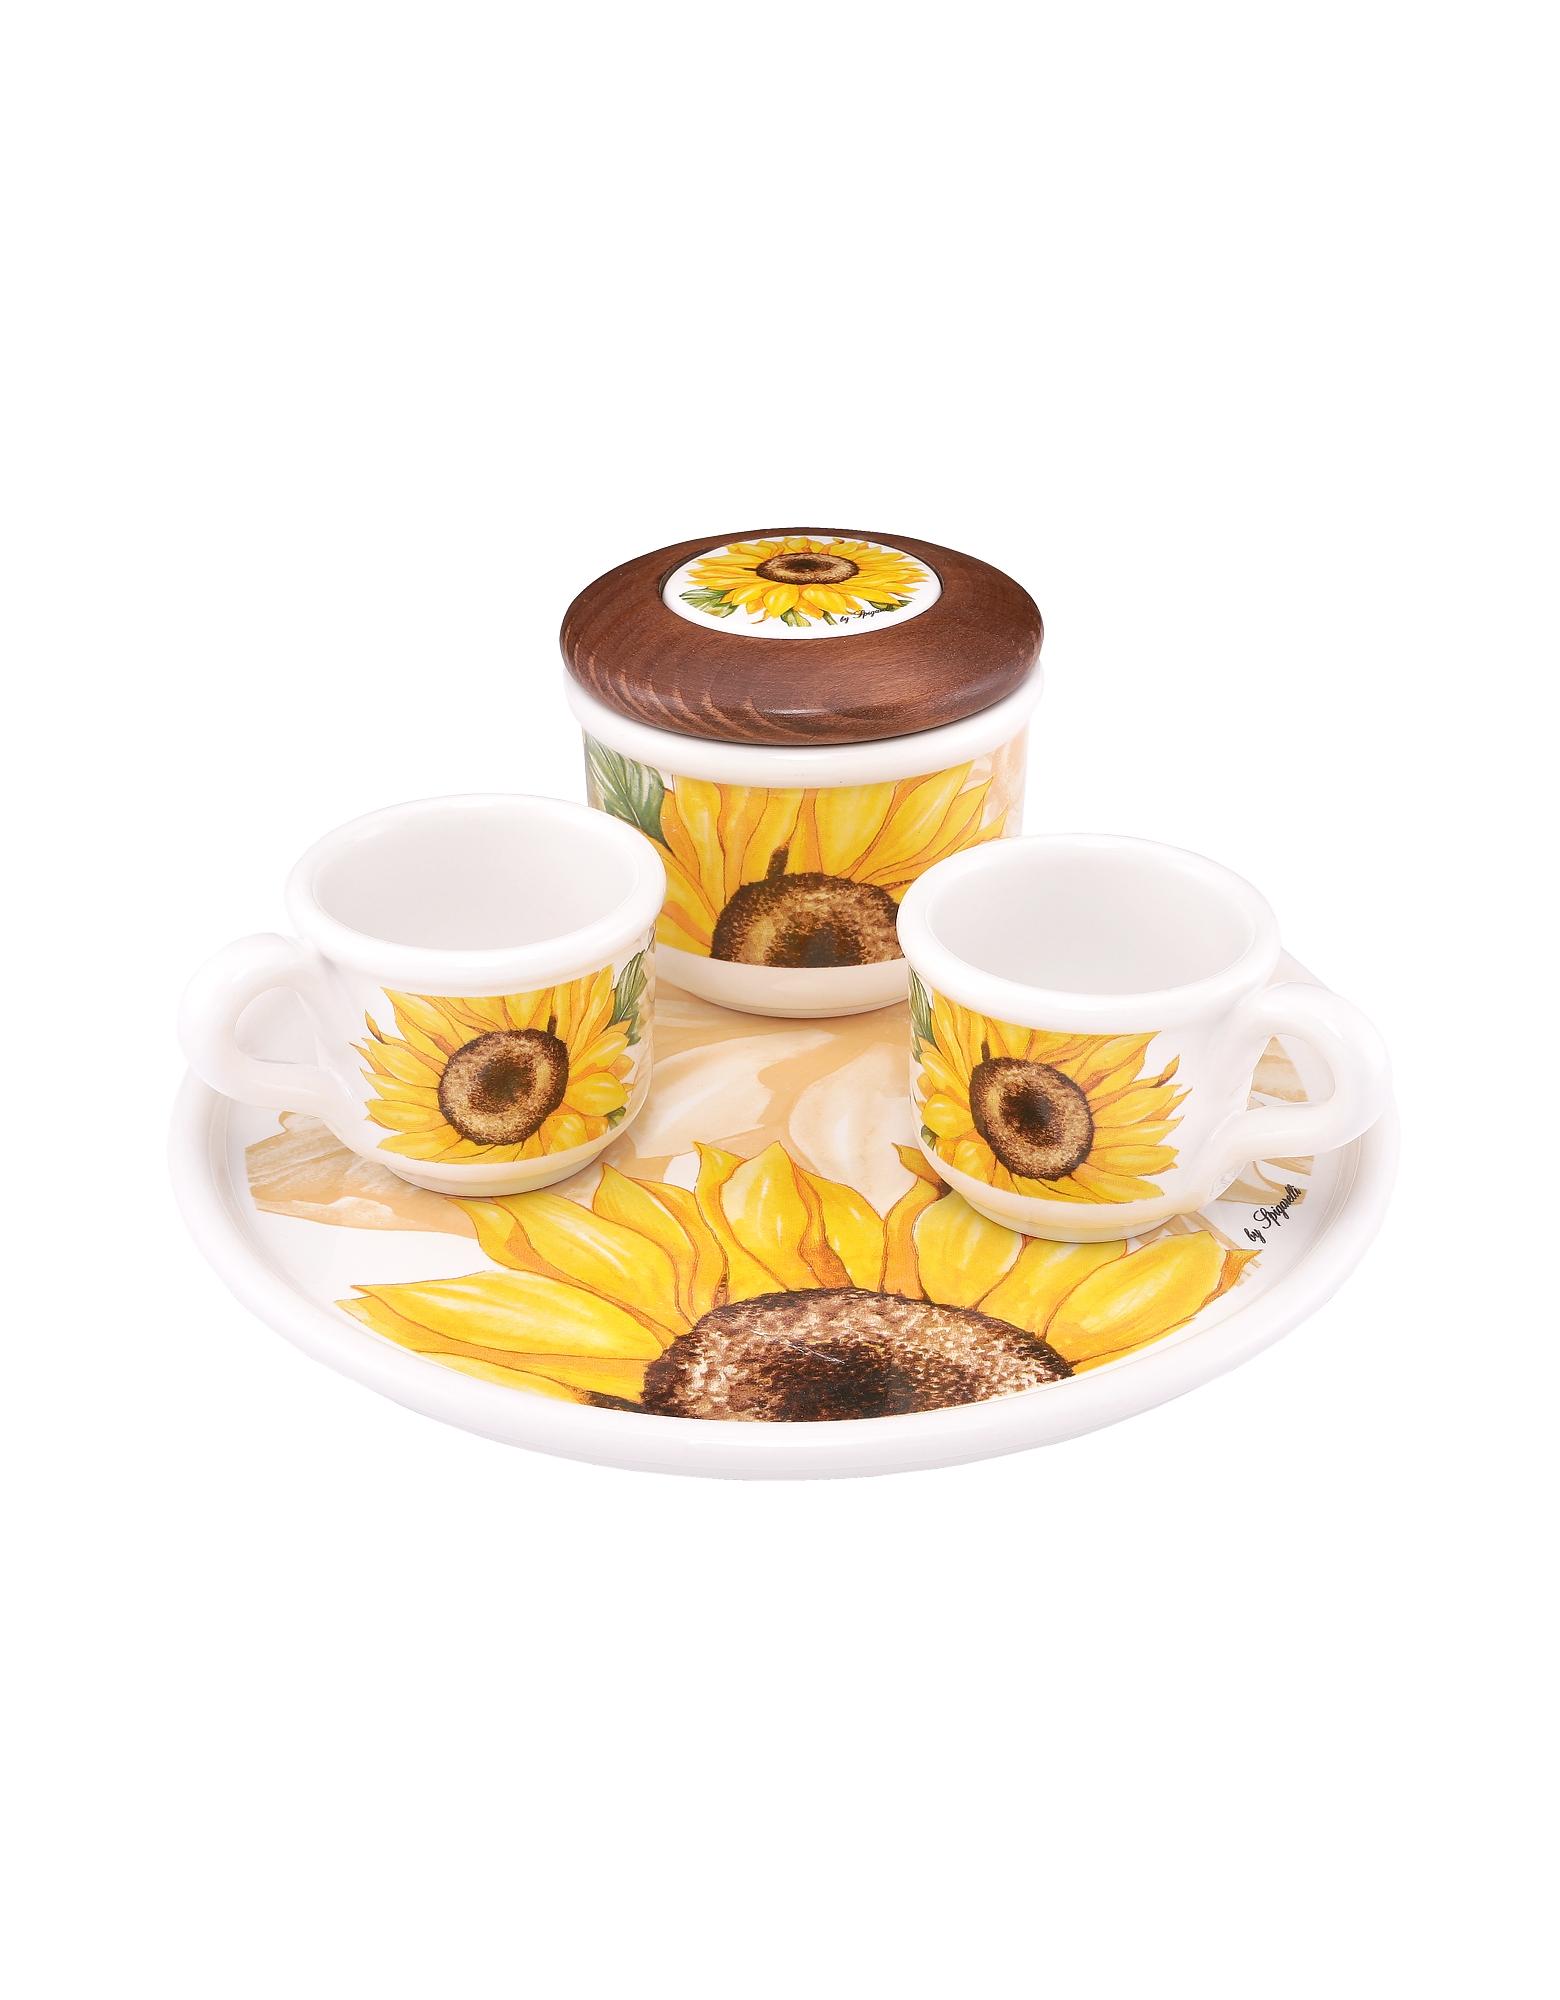 Spigarelli Designer Kitchen & Dining, Sugar and Mocha Cups Sunflower Ceramic Set w/Tray